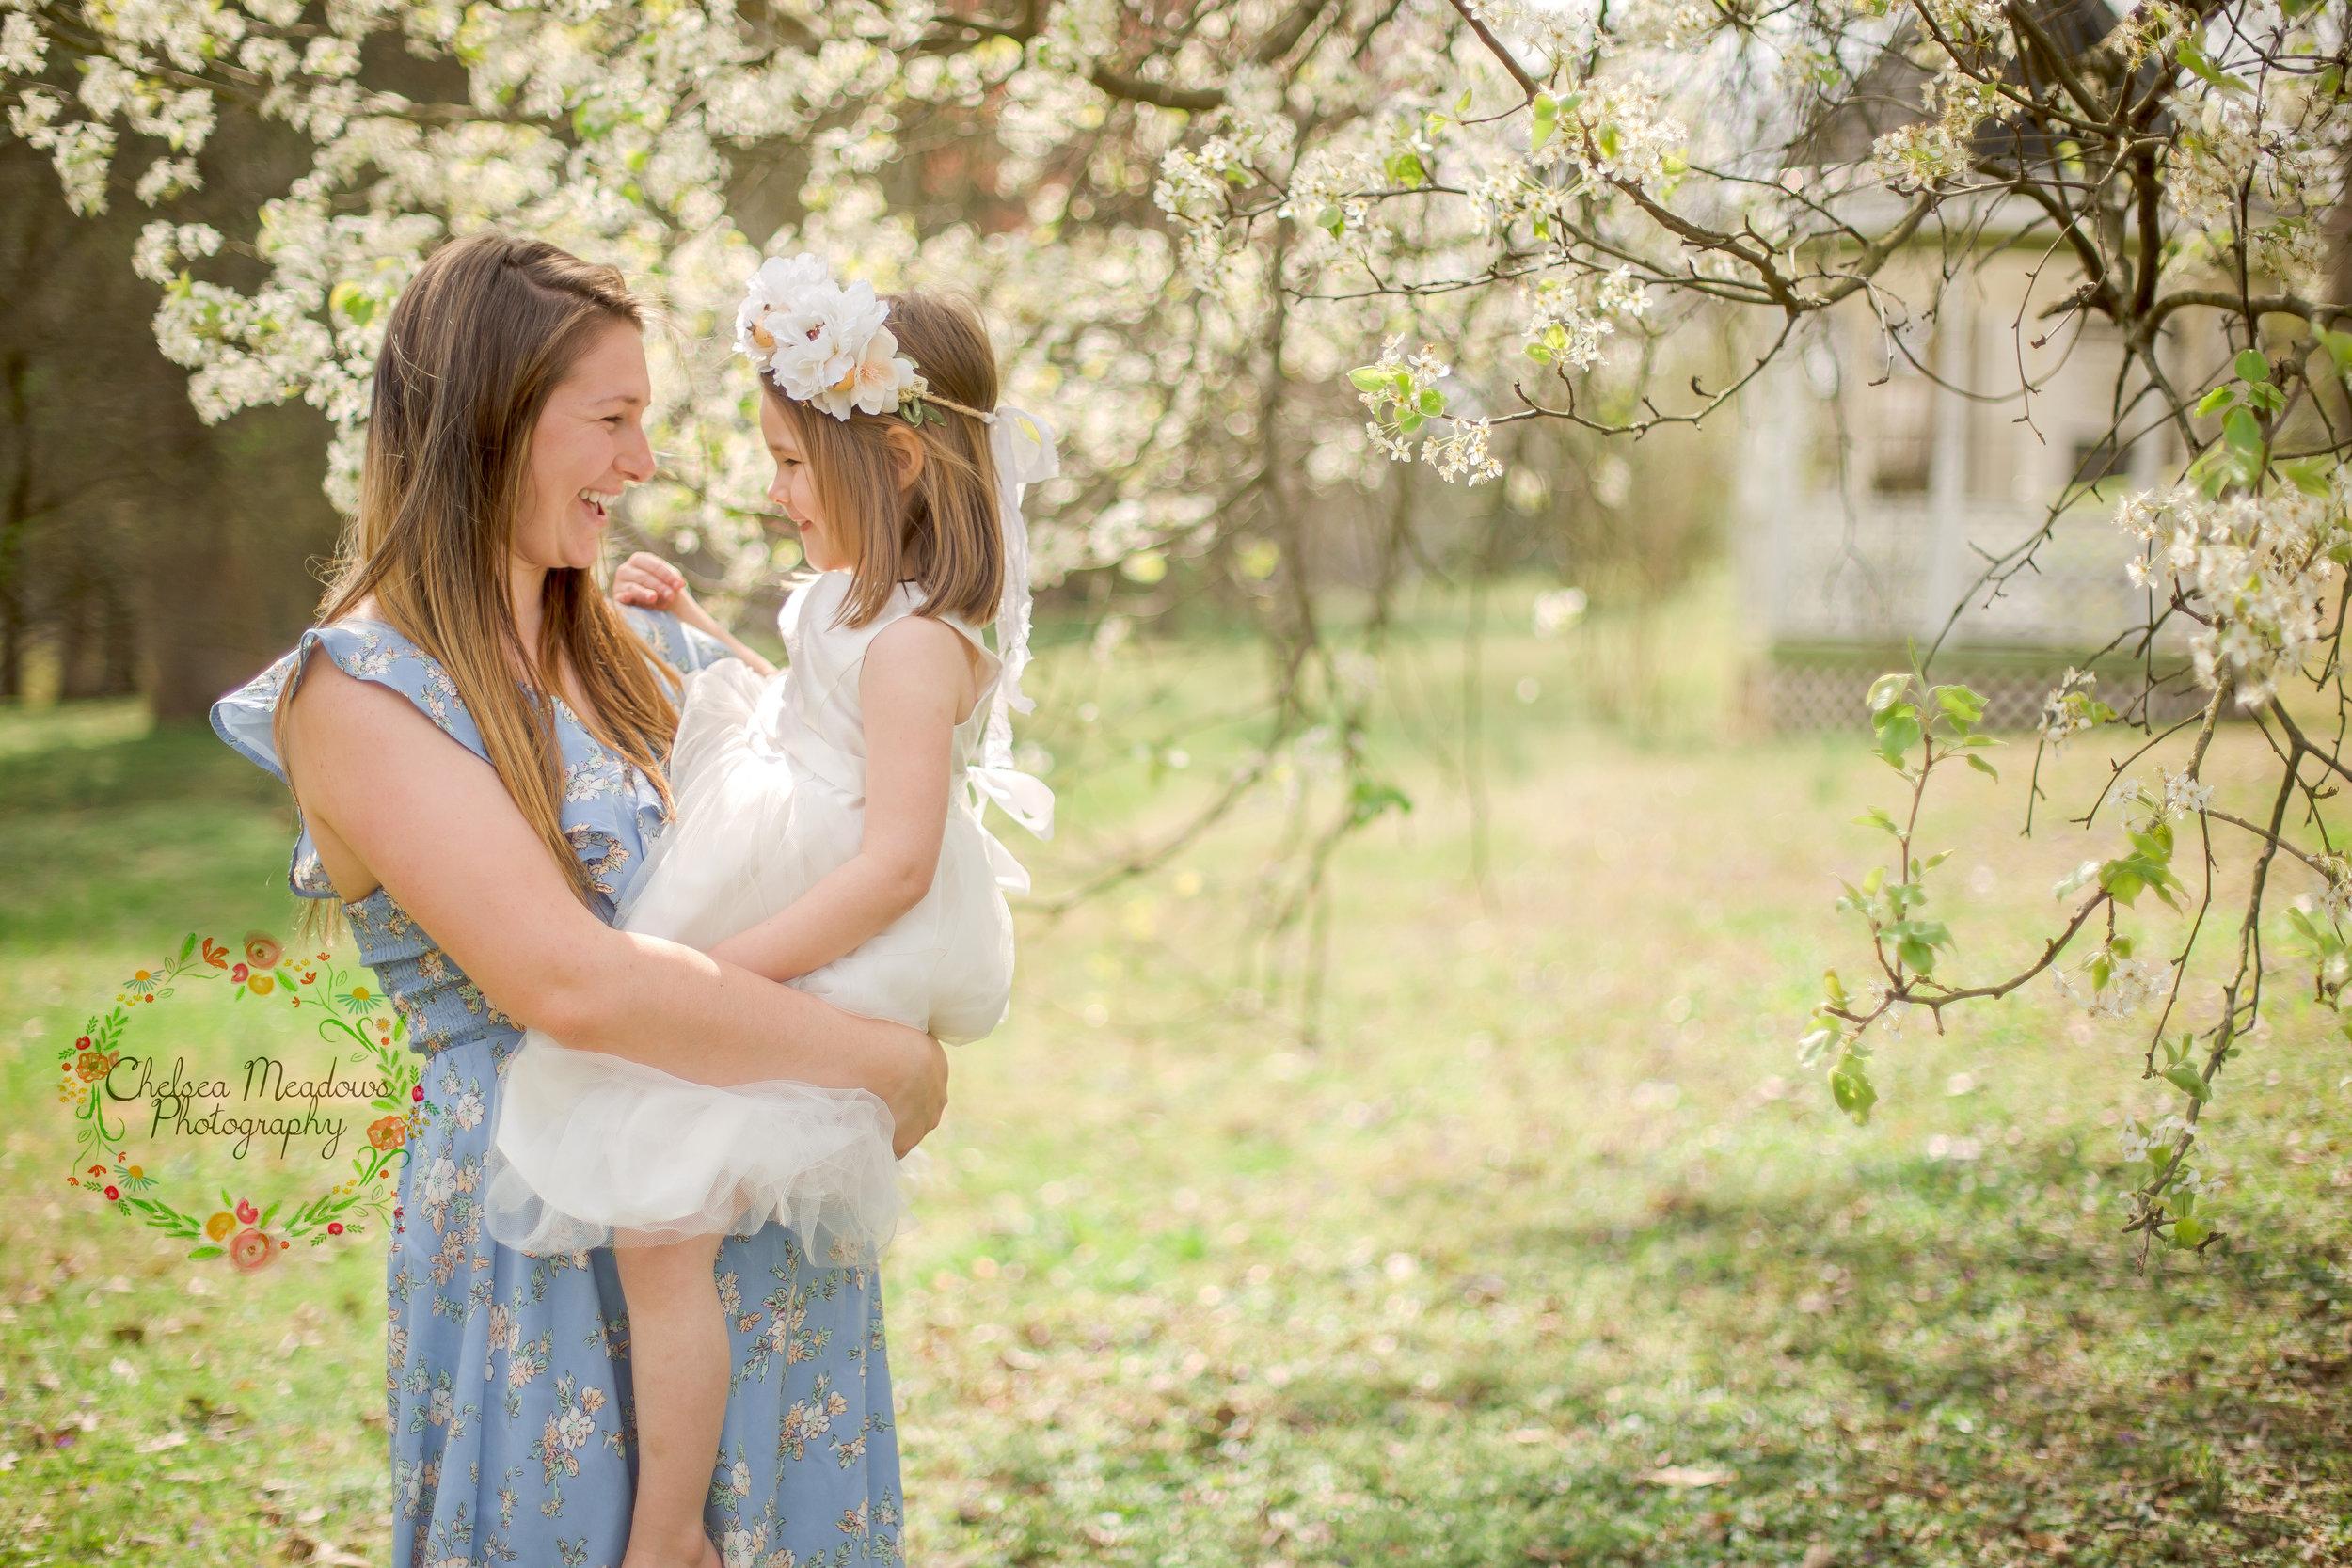 Ellis Family Spring Minis - Nashville Family Photographer - Chelsea Meadows Photography (4)_edited-1.jpg